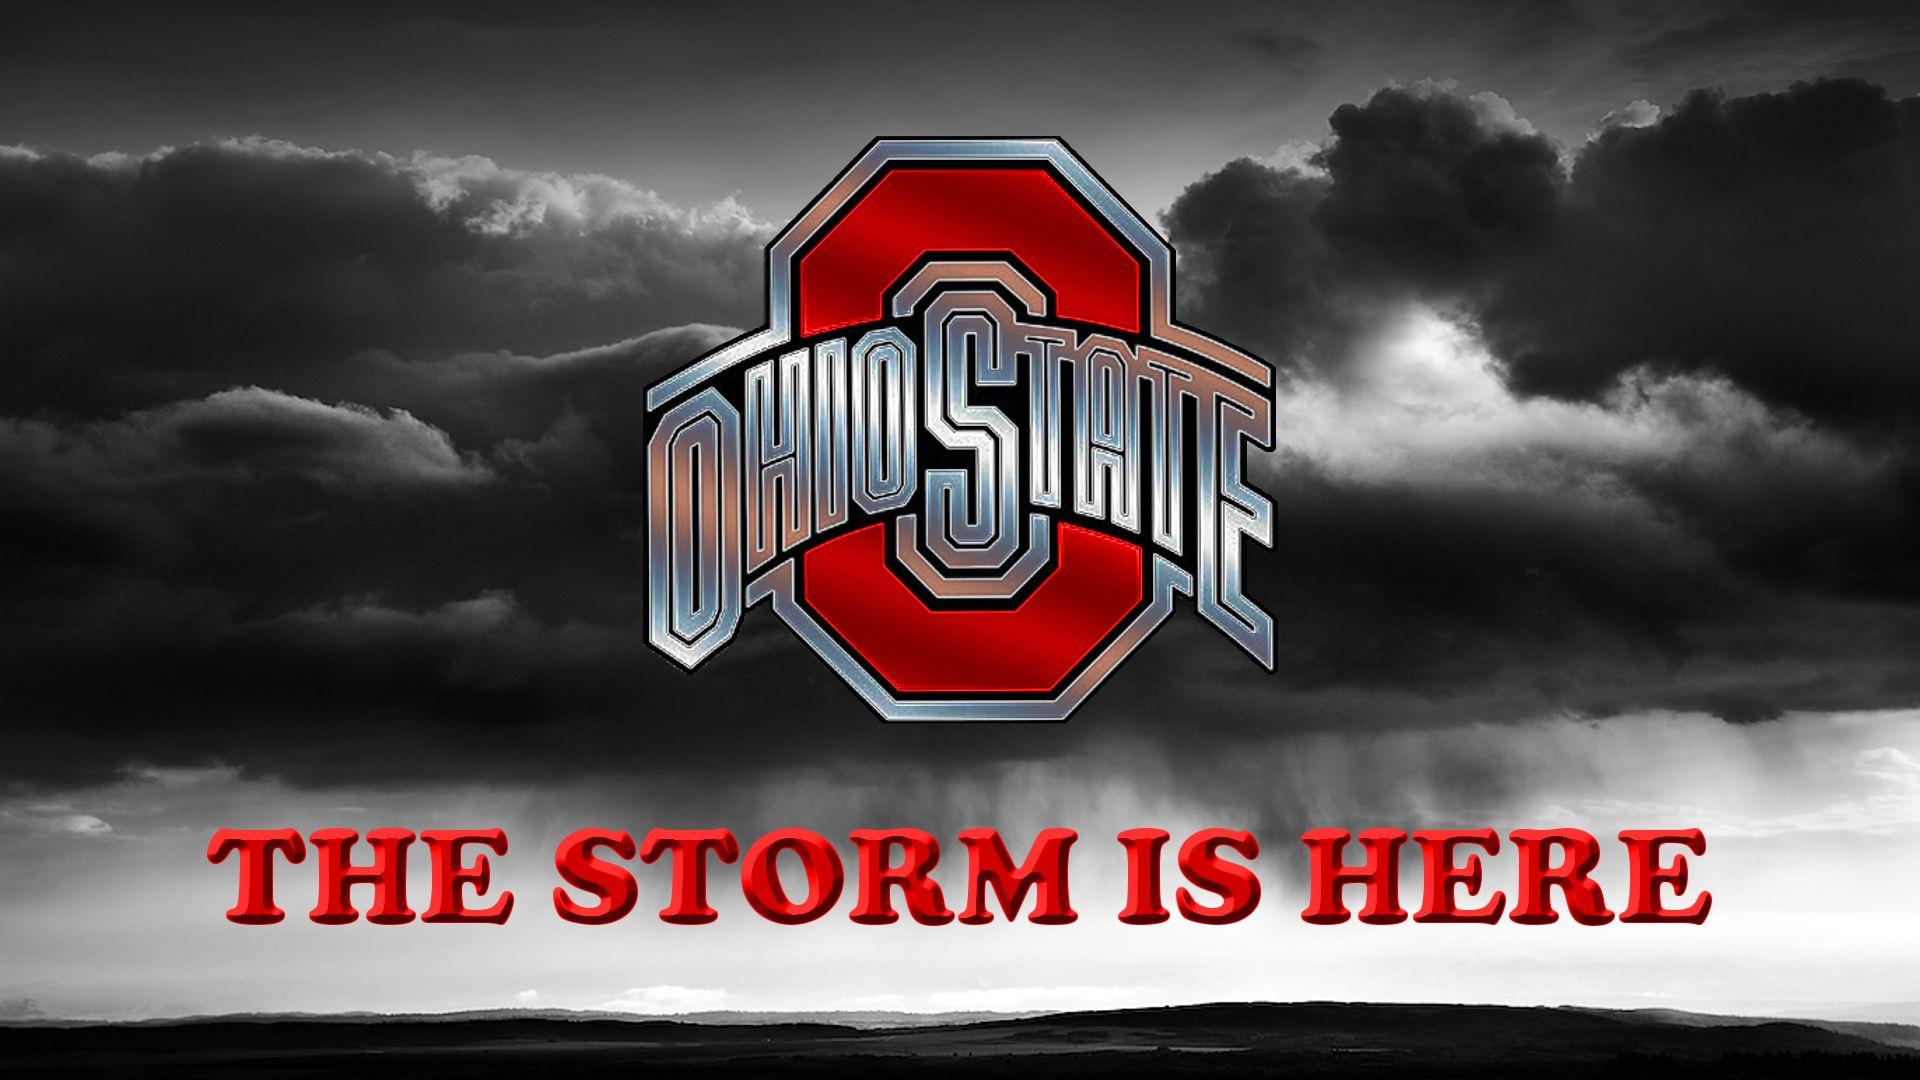 OSU Wallpaper 450 Ohio State Buckeyes Pinterest